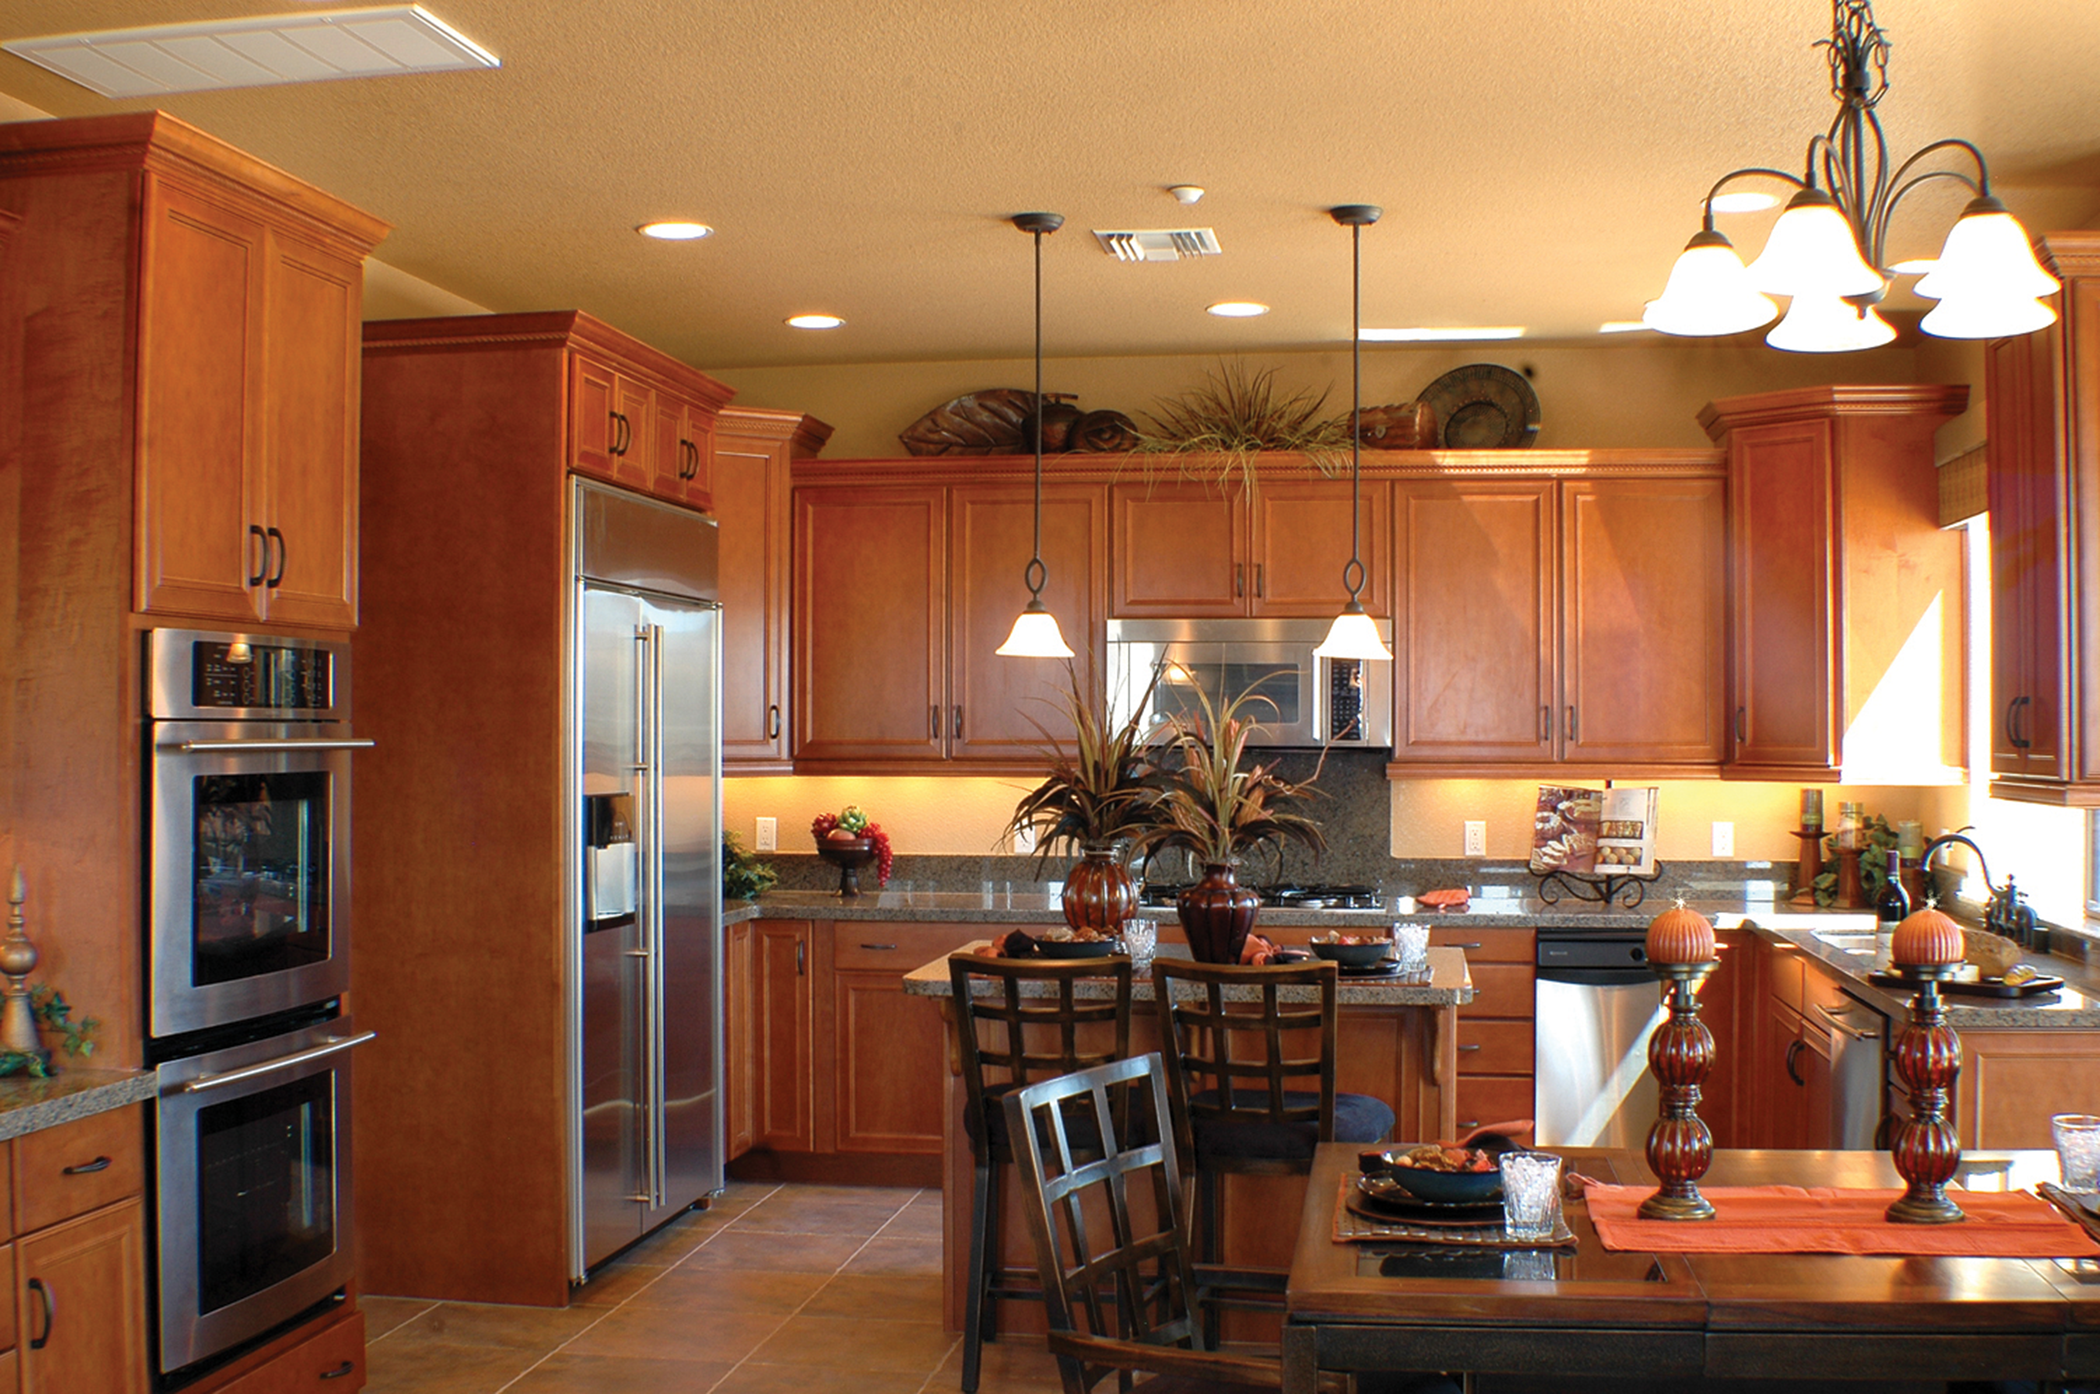 kitchen #2 retouched